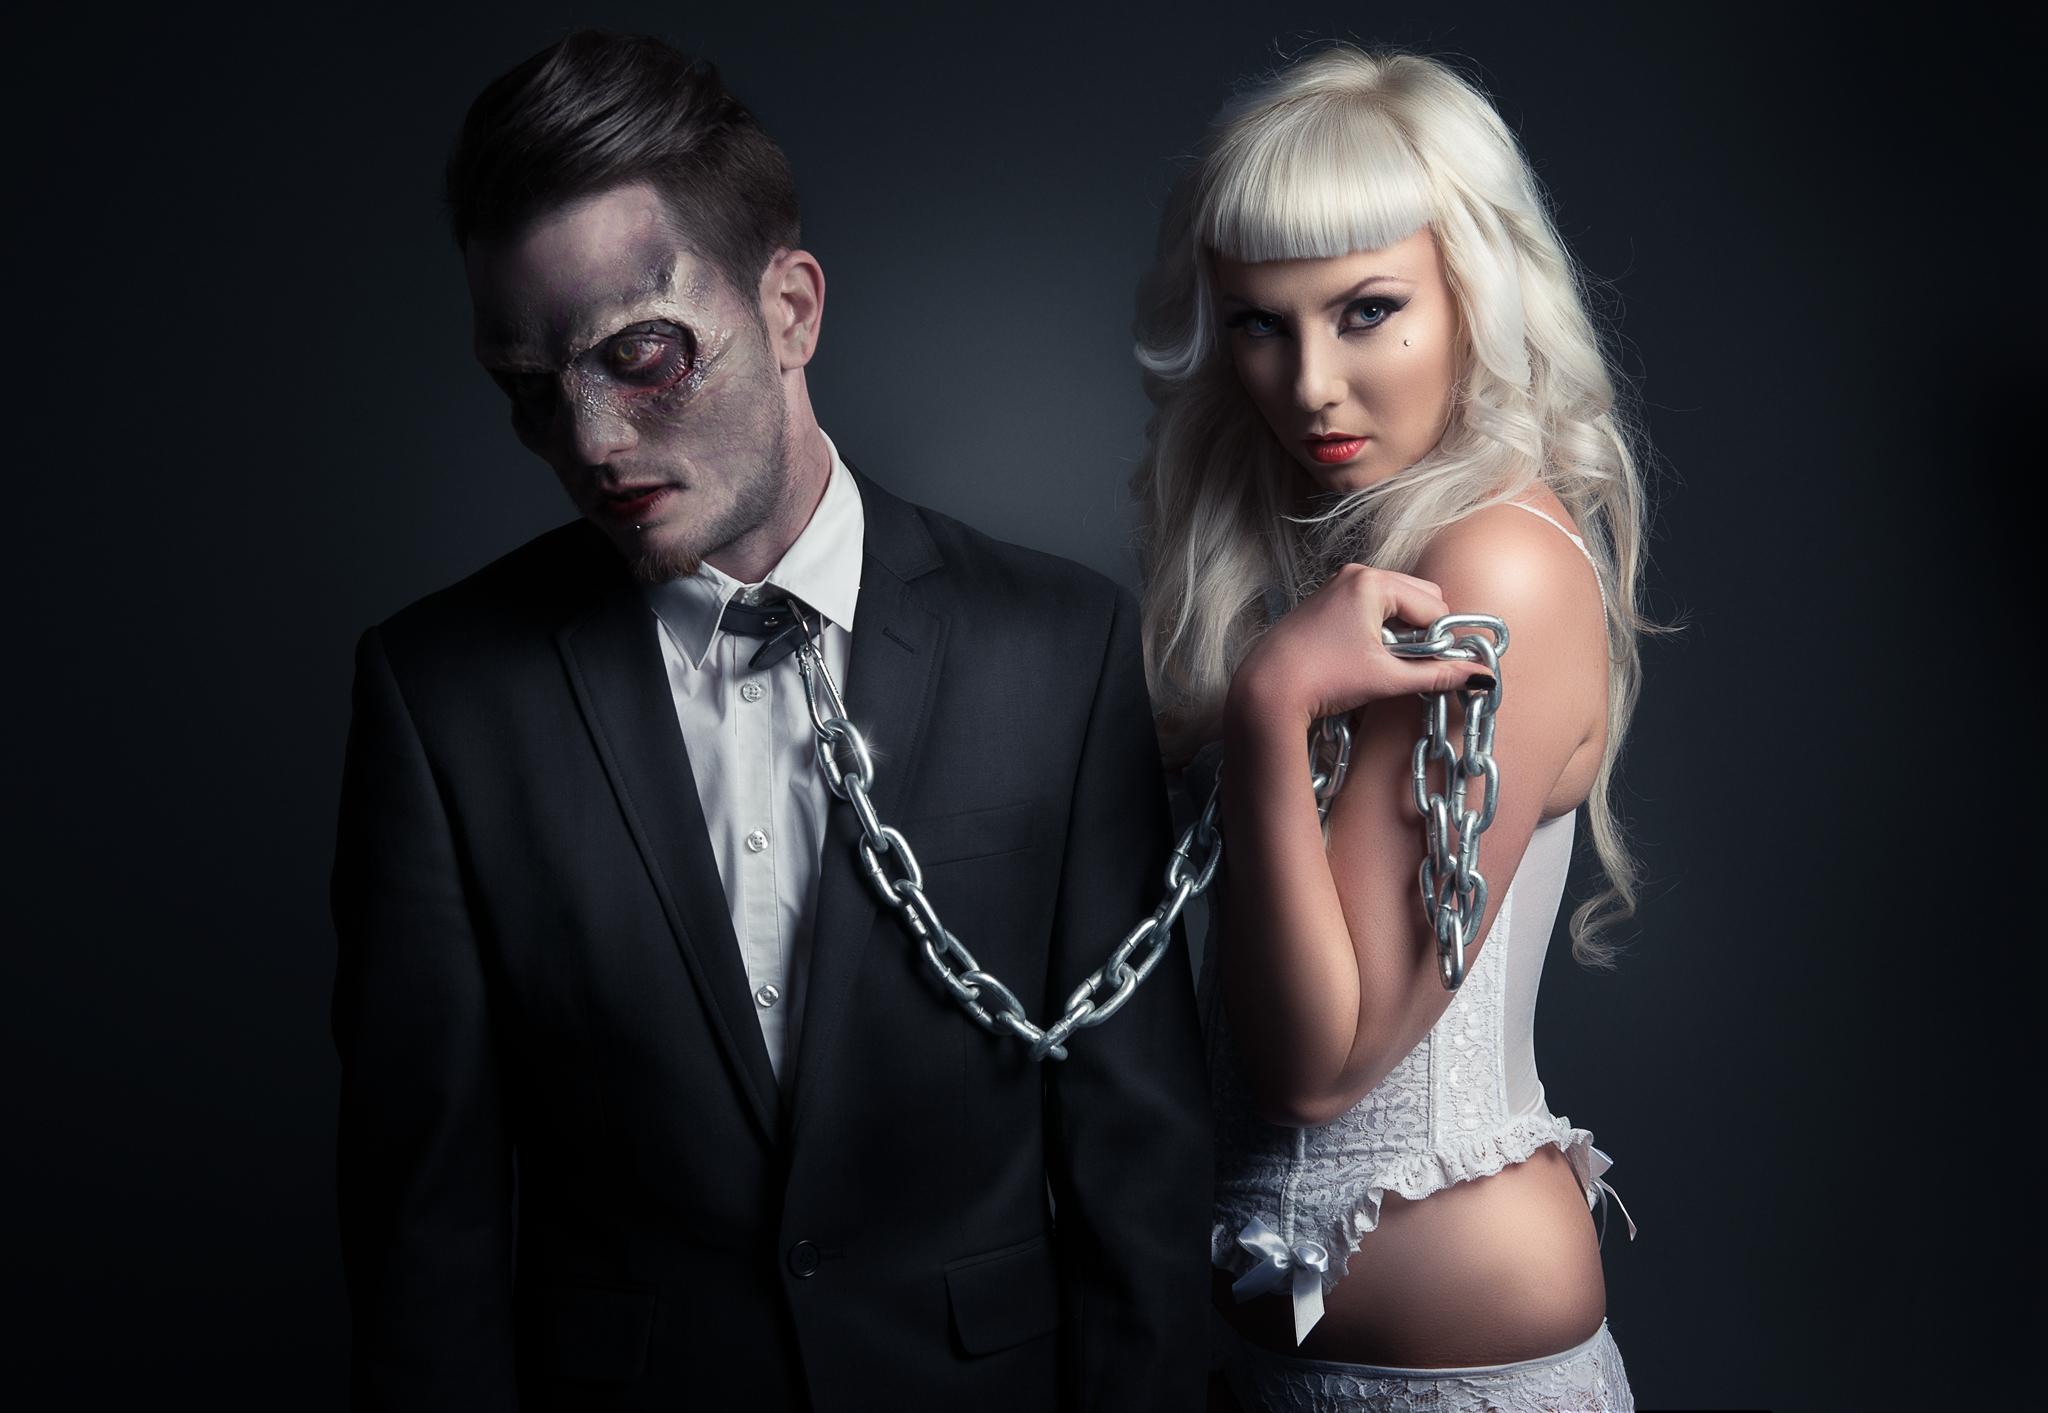 Gavin Moroney (Gavincreativephotography) - Jade Zombie Modelling and Benzi Alford - hair makeup Daisy Llewellyn Hairdressing